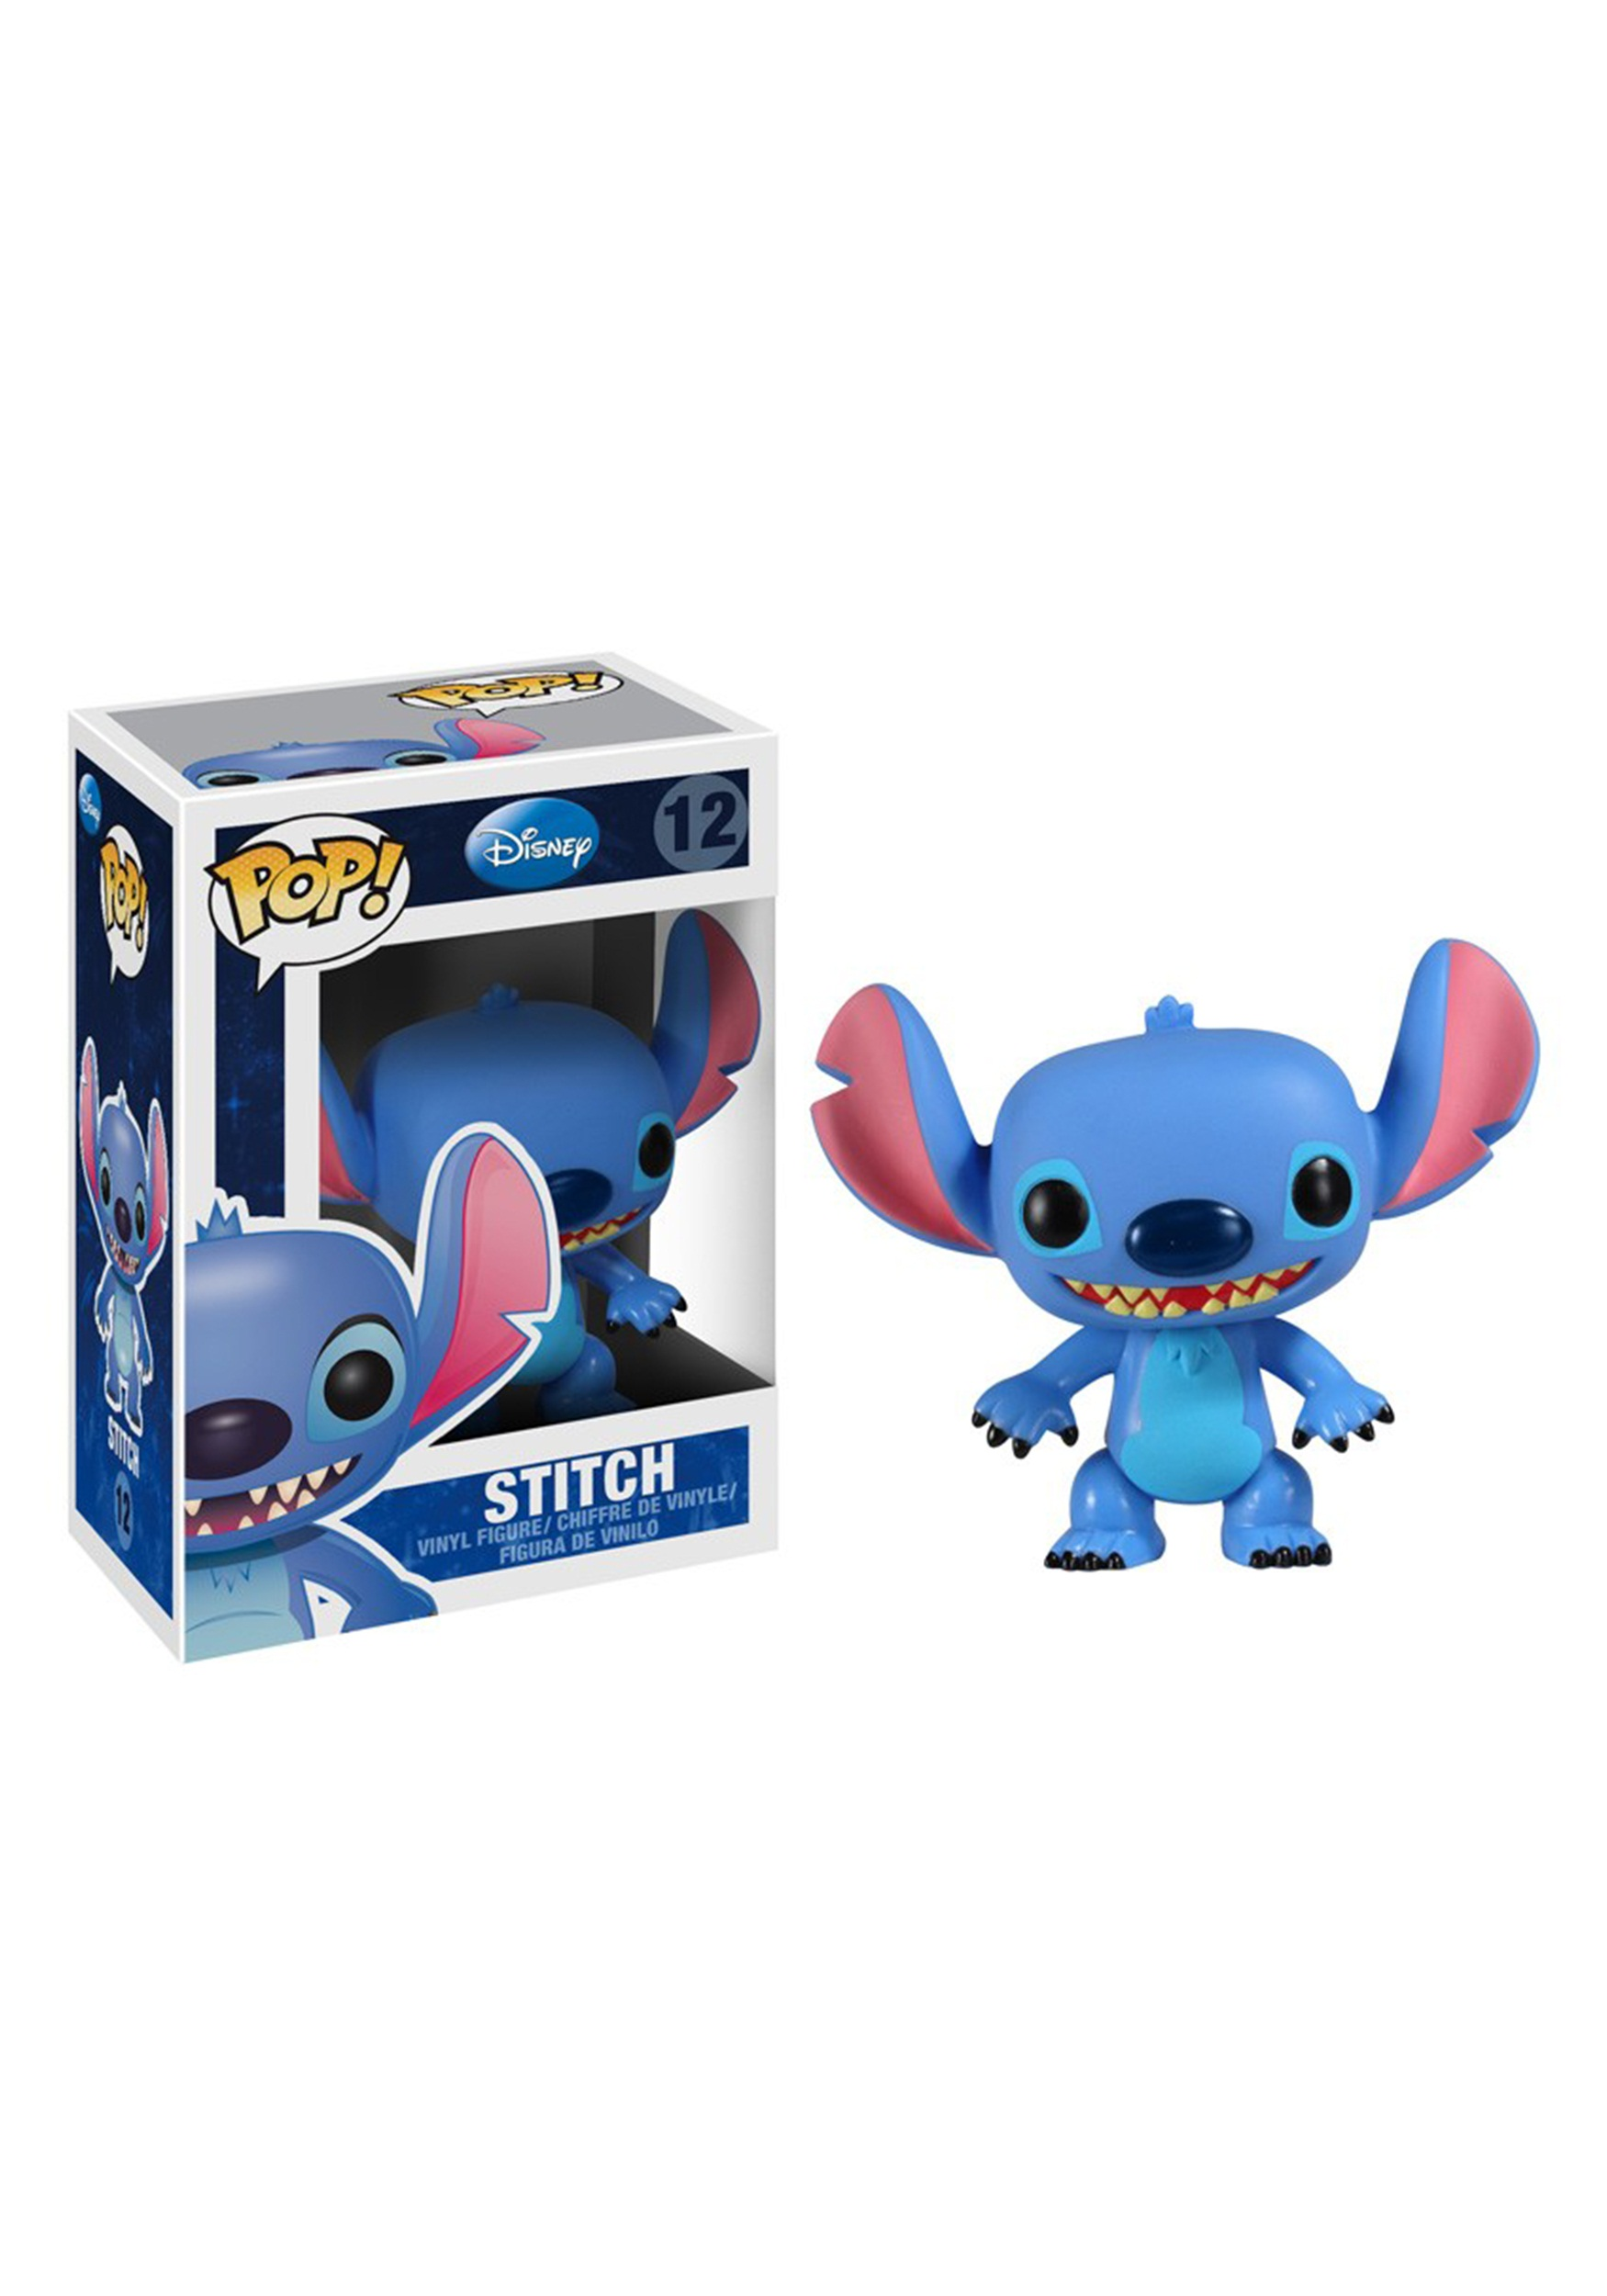 Disney Stitch Vinyl Figure POP!